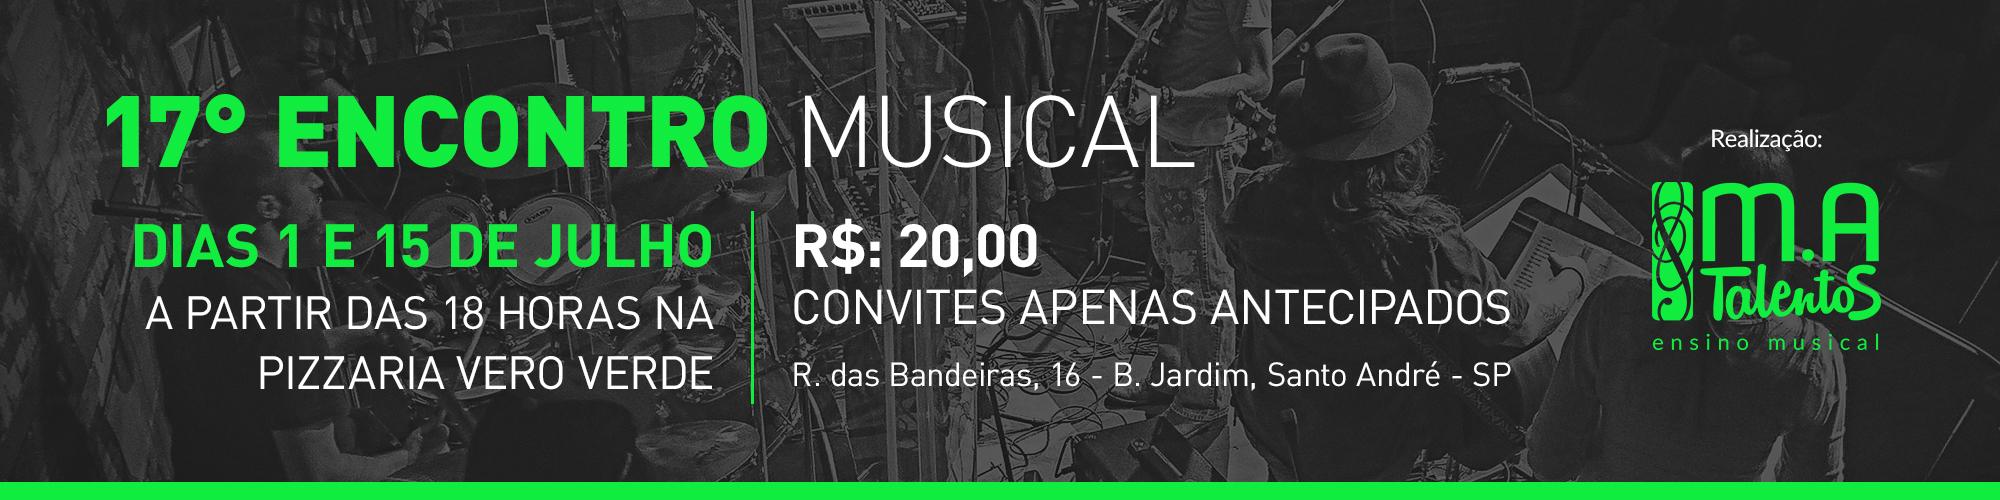 BANNER-17° ENCONTRO MUSICAL